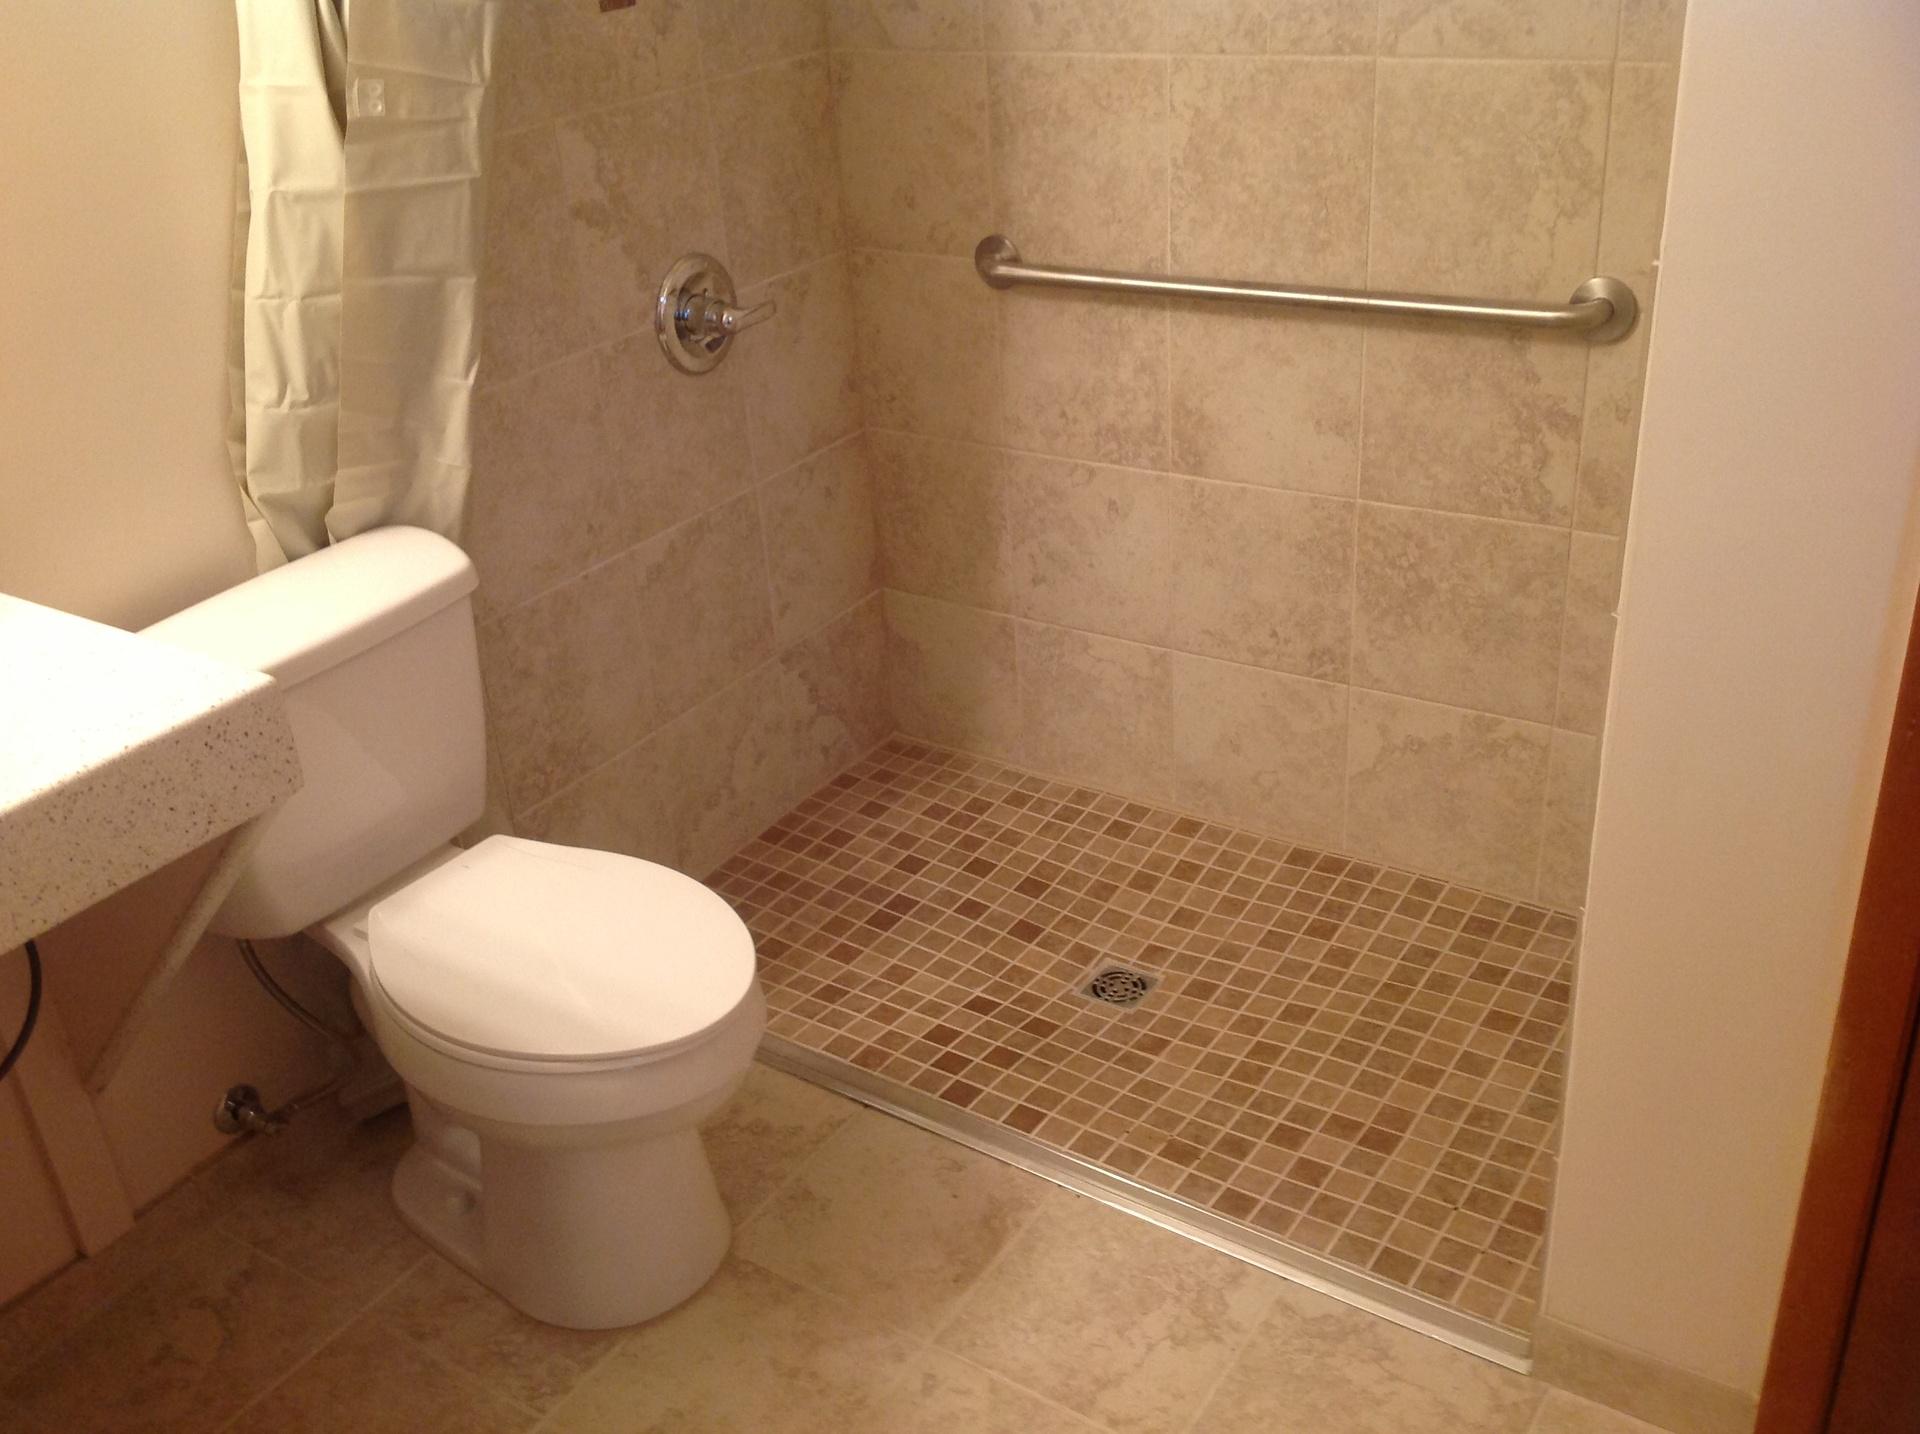 Bathroom Remodeling on 30A and Destin, FL